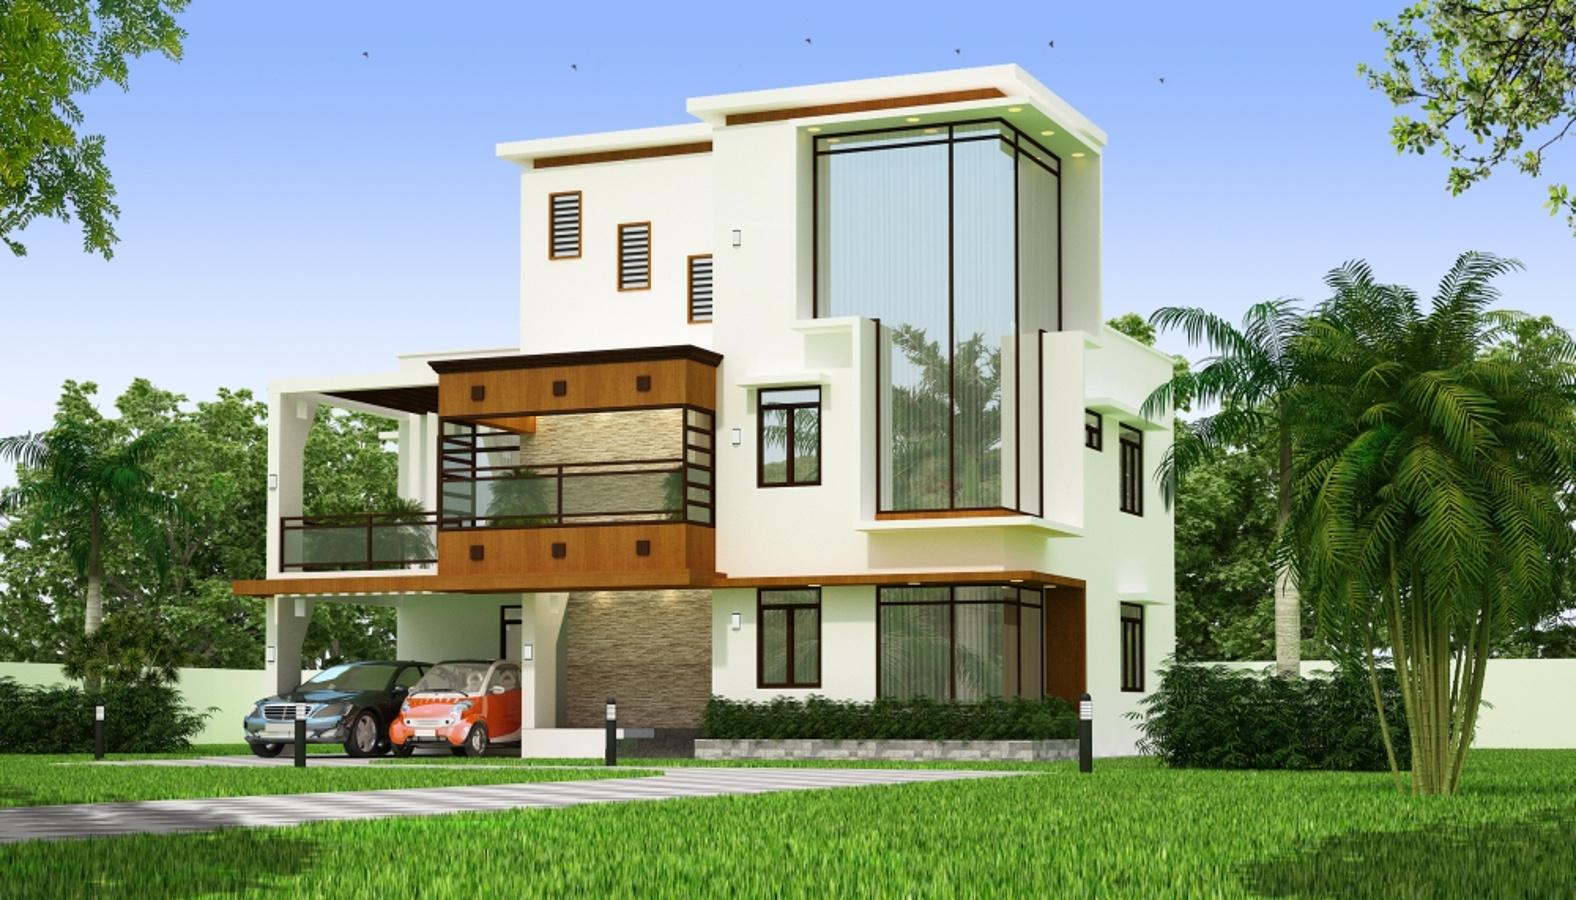 Main Elevation Image 1 Of Medham Developer Aster Villas